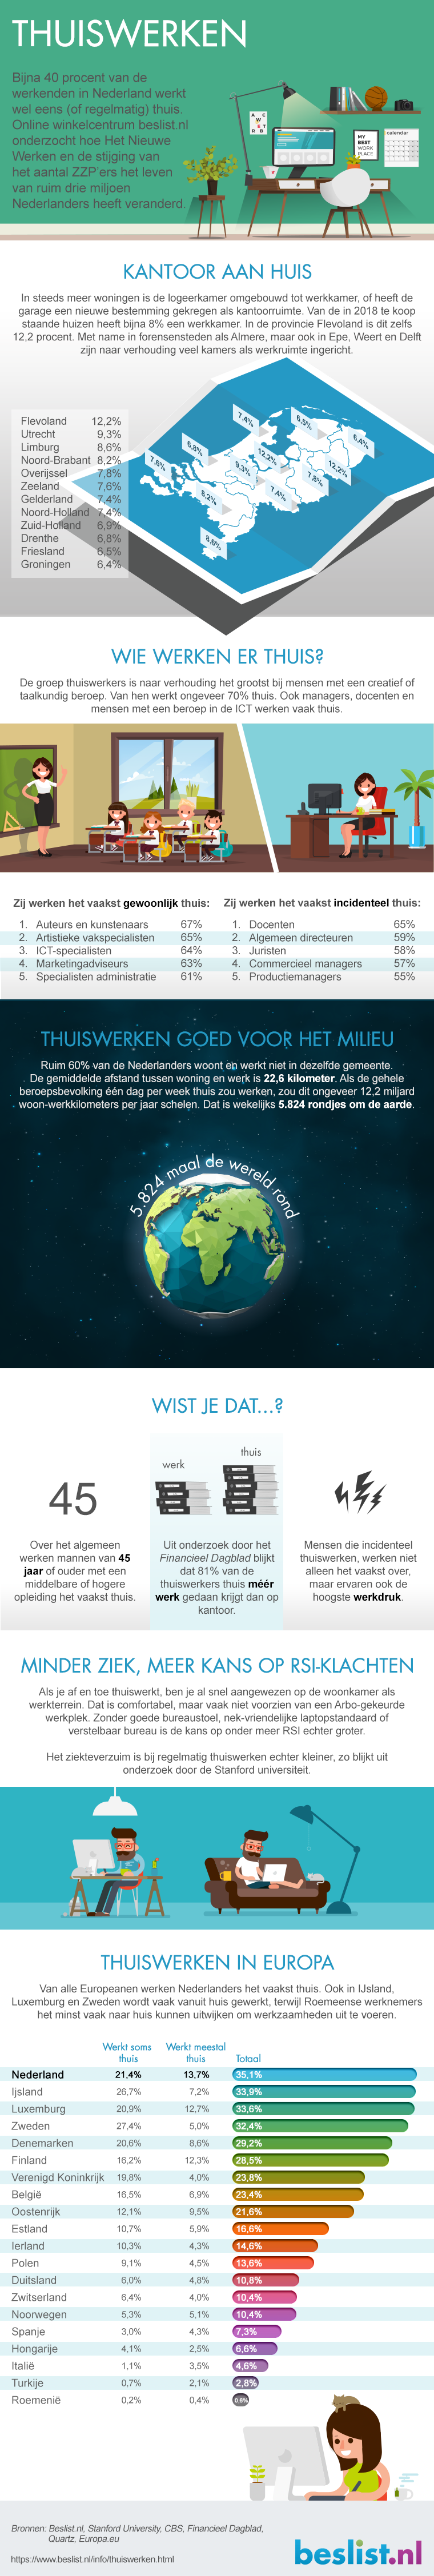 Infographic: Thuiswerken